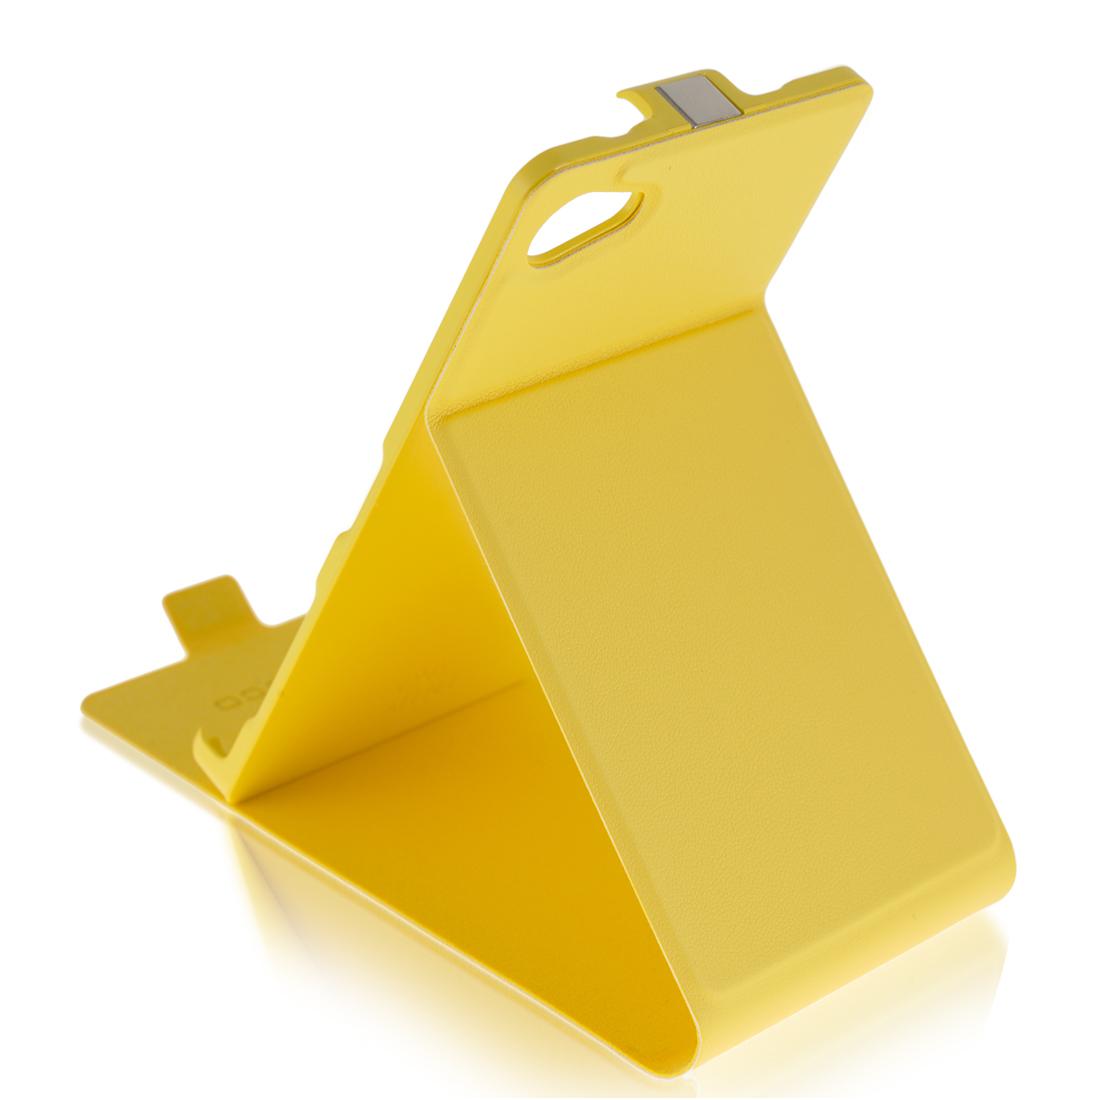 Флиппер жёлтый для Xperia Z5 Compact в Sony Centre